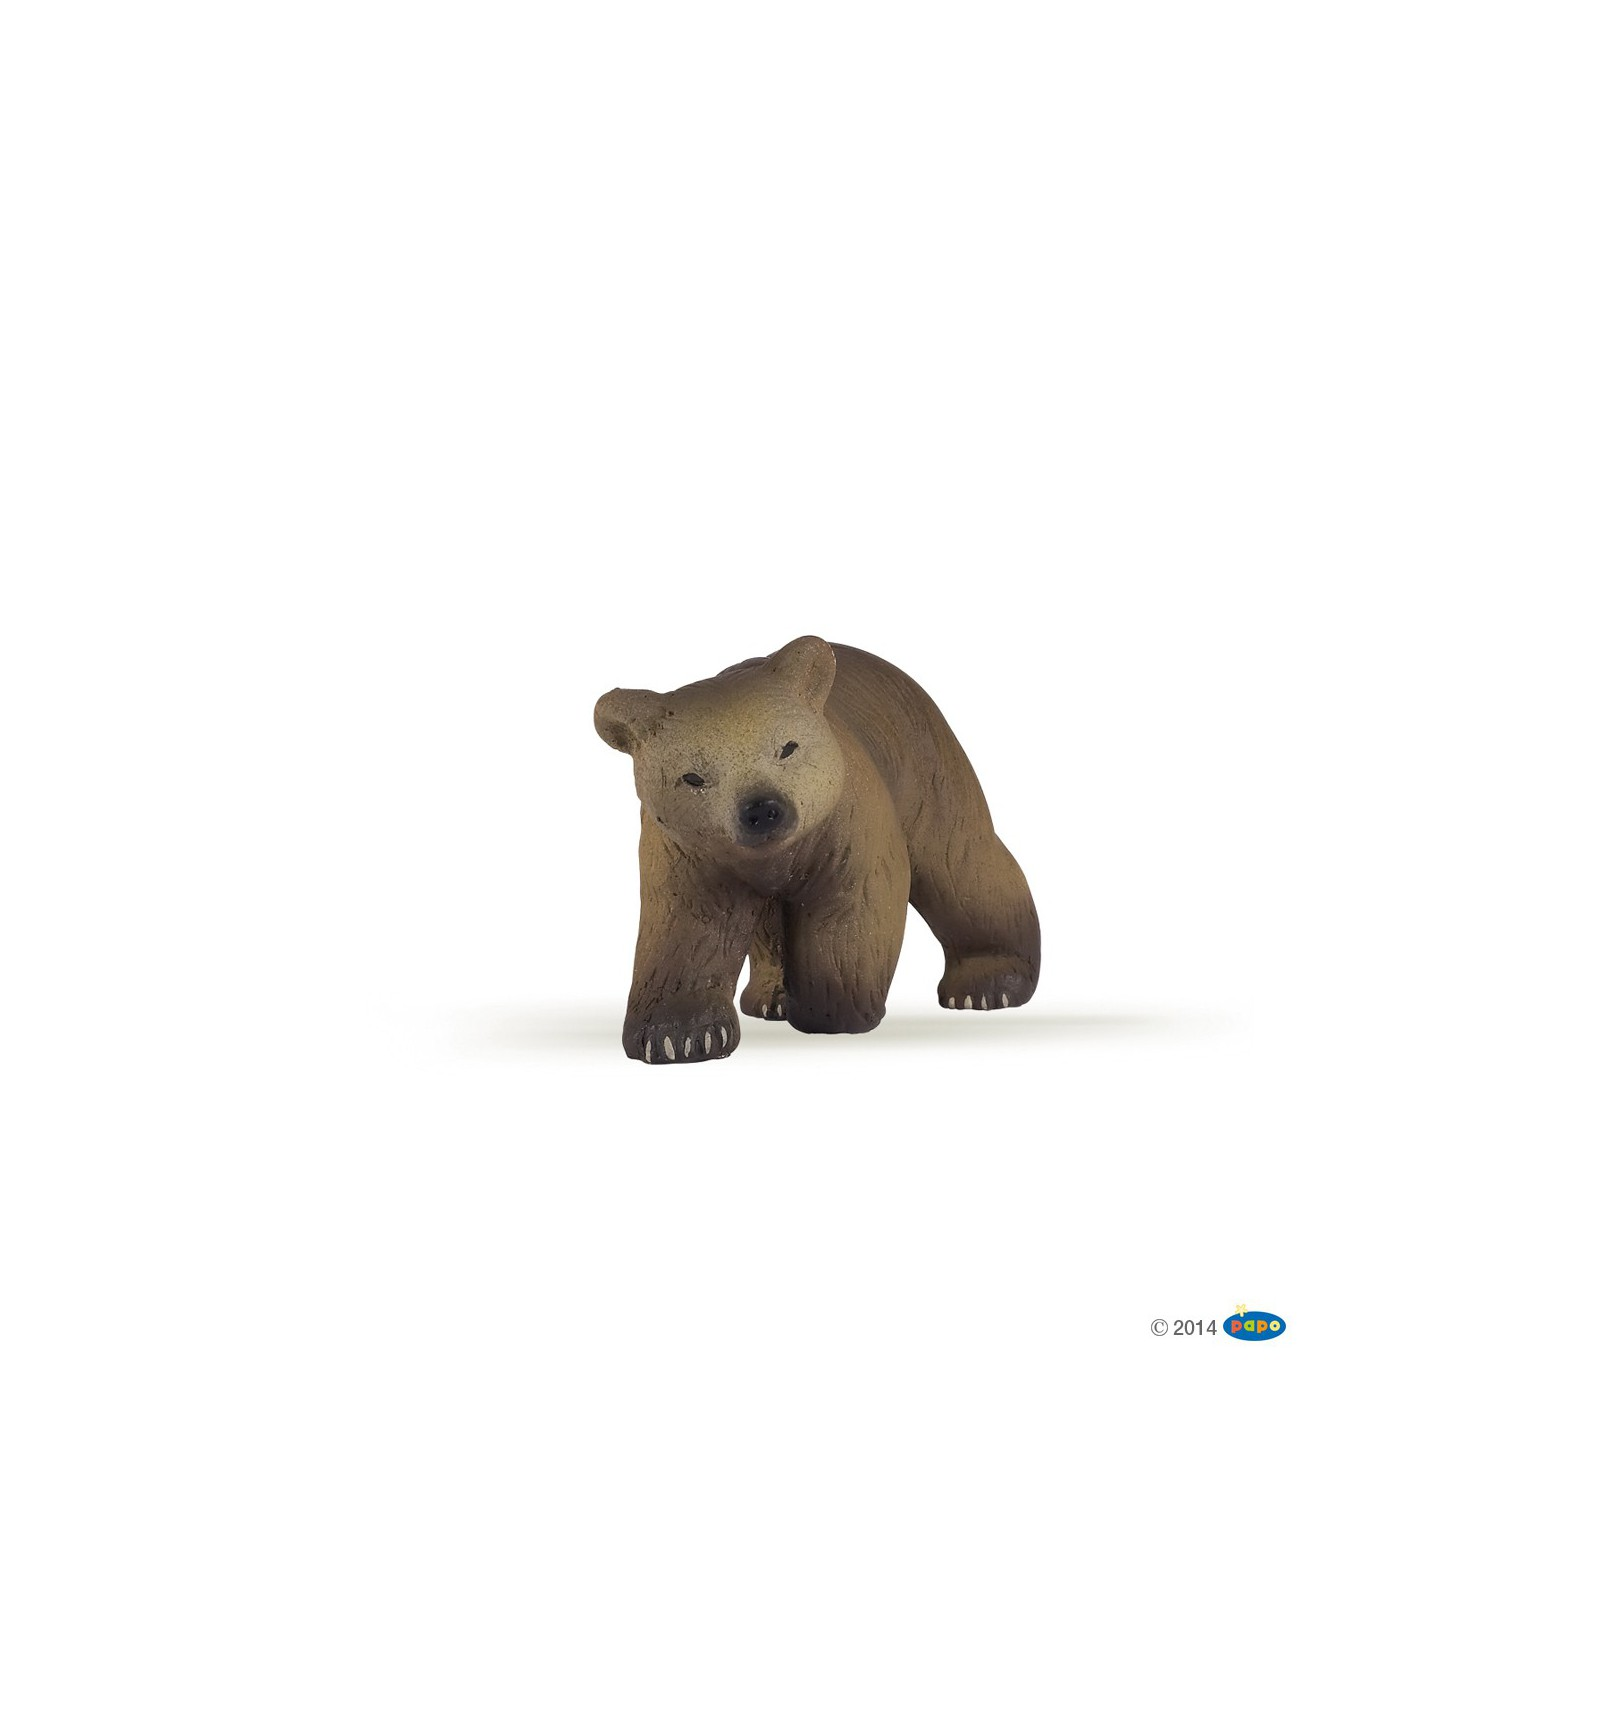 Pyrenees Bear Cub Papo Brown Animals 50031